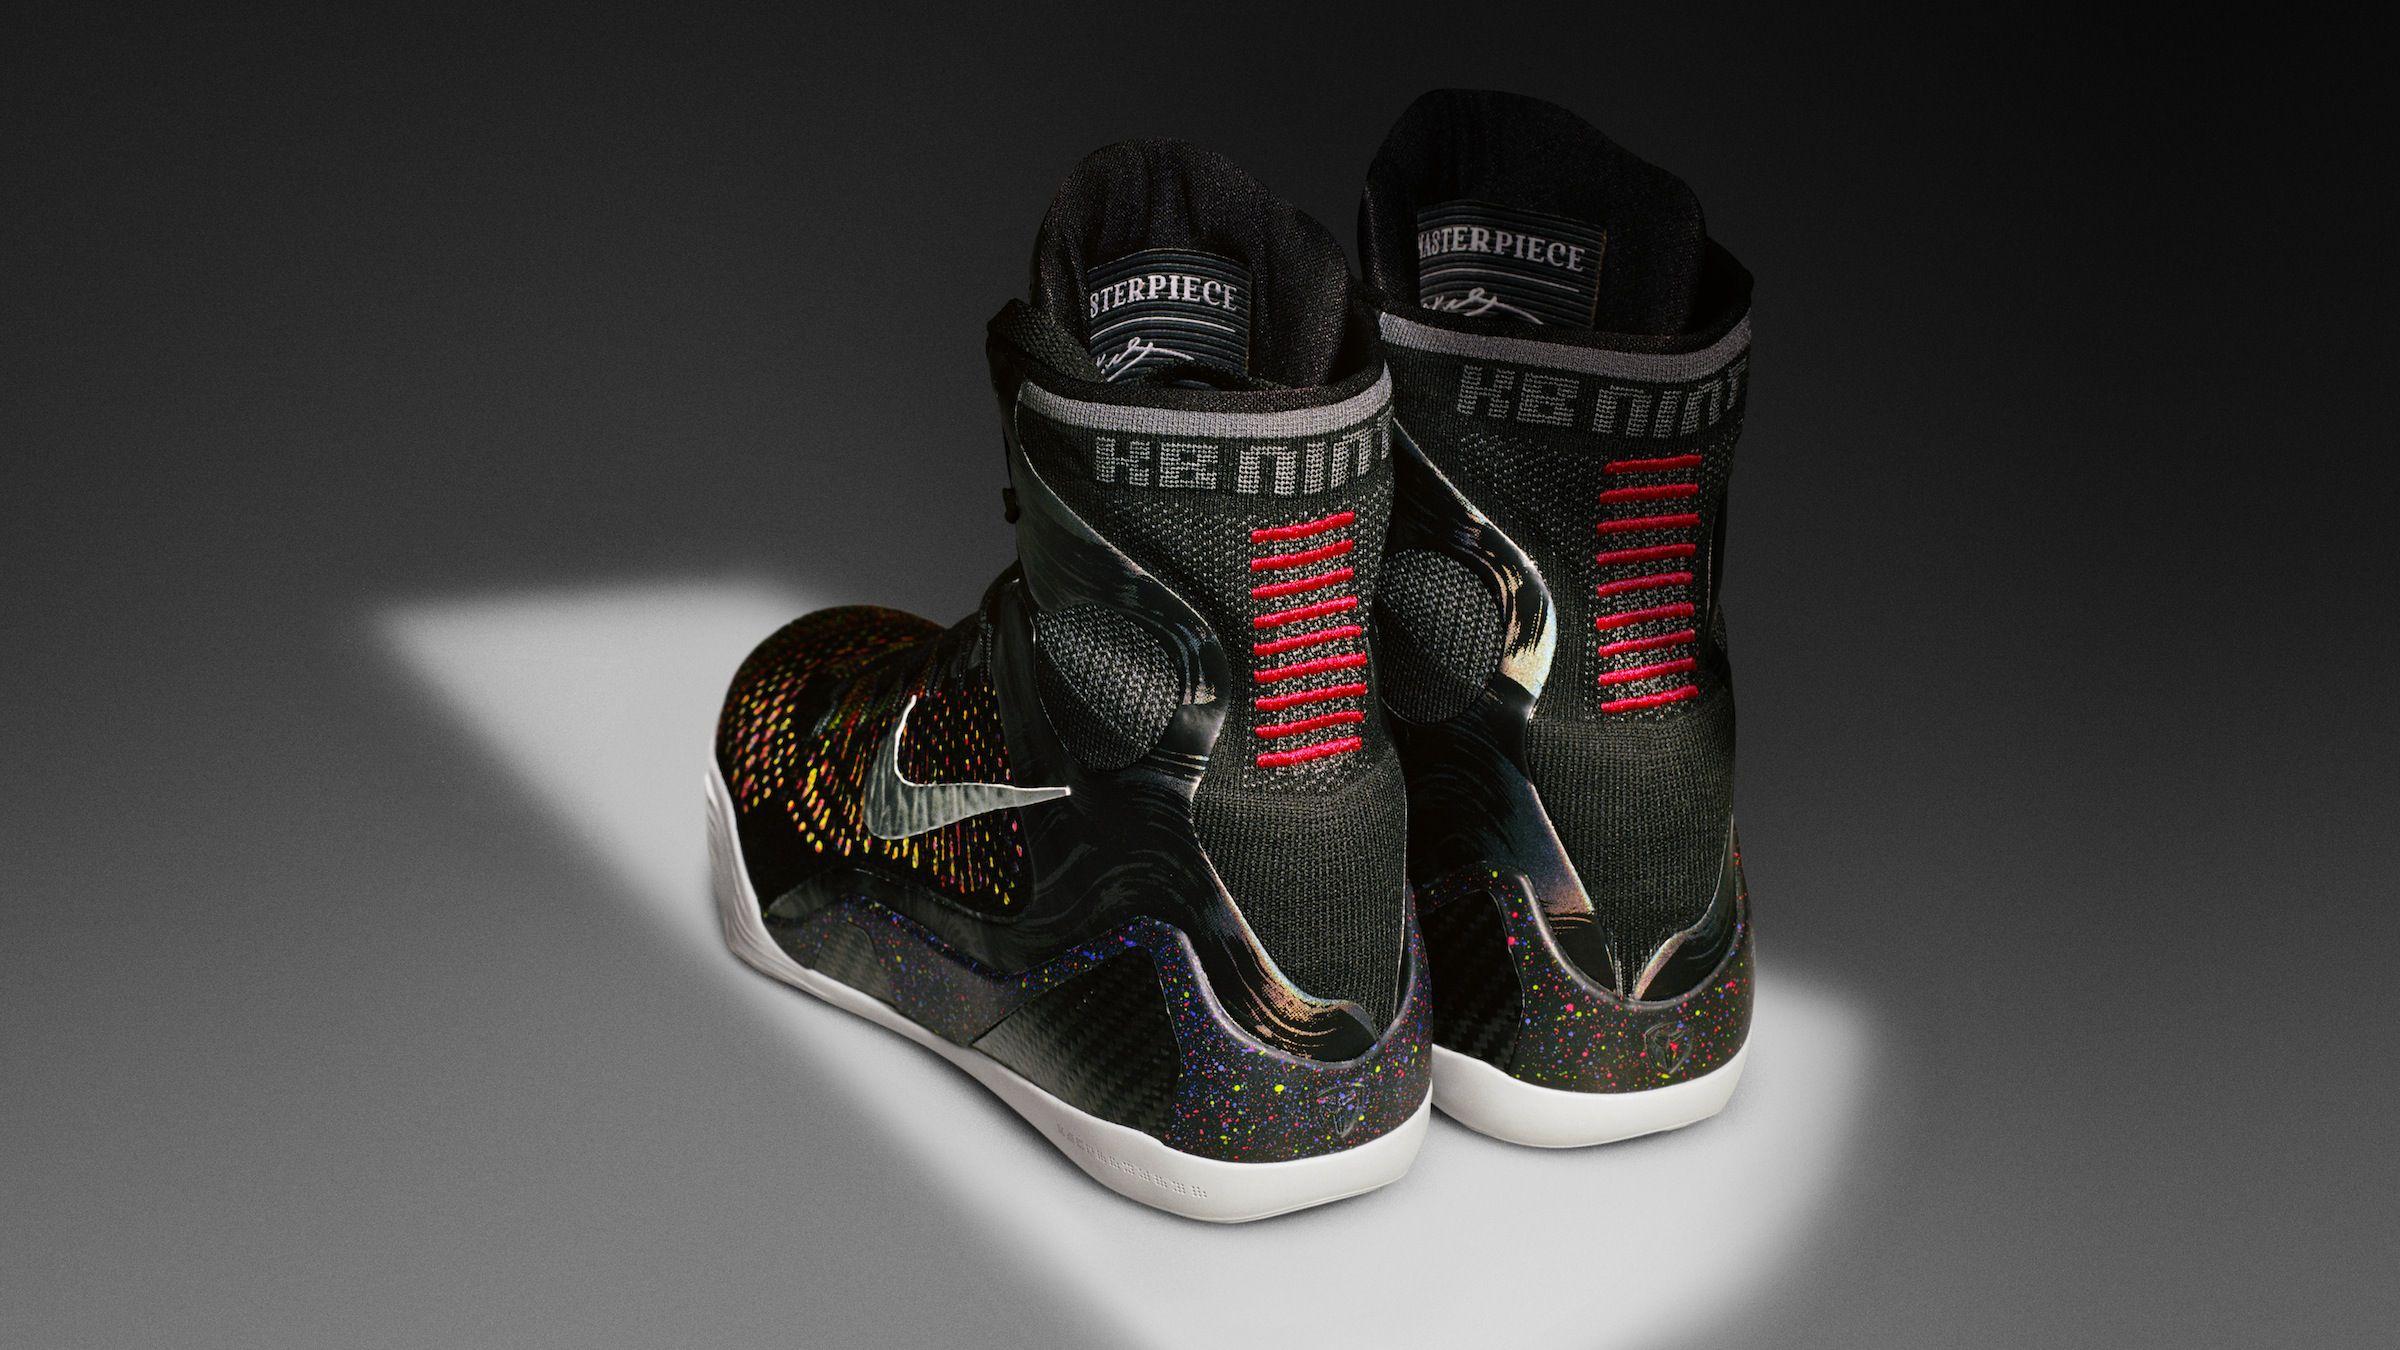 cheaper 560b8 691ce China s favorite basketball star unveils the Nike Kobe 9 Elite shoe